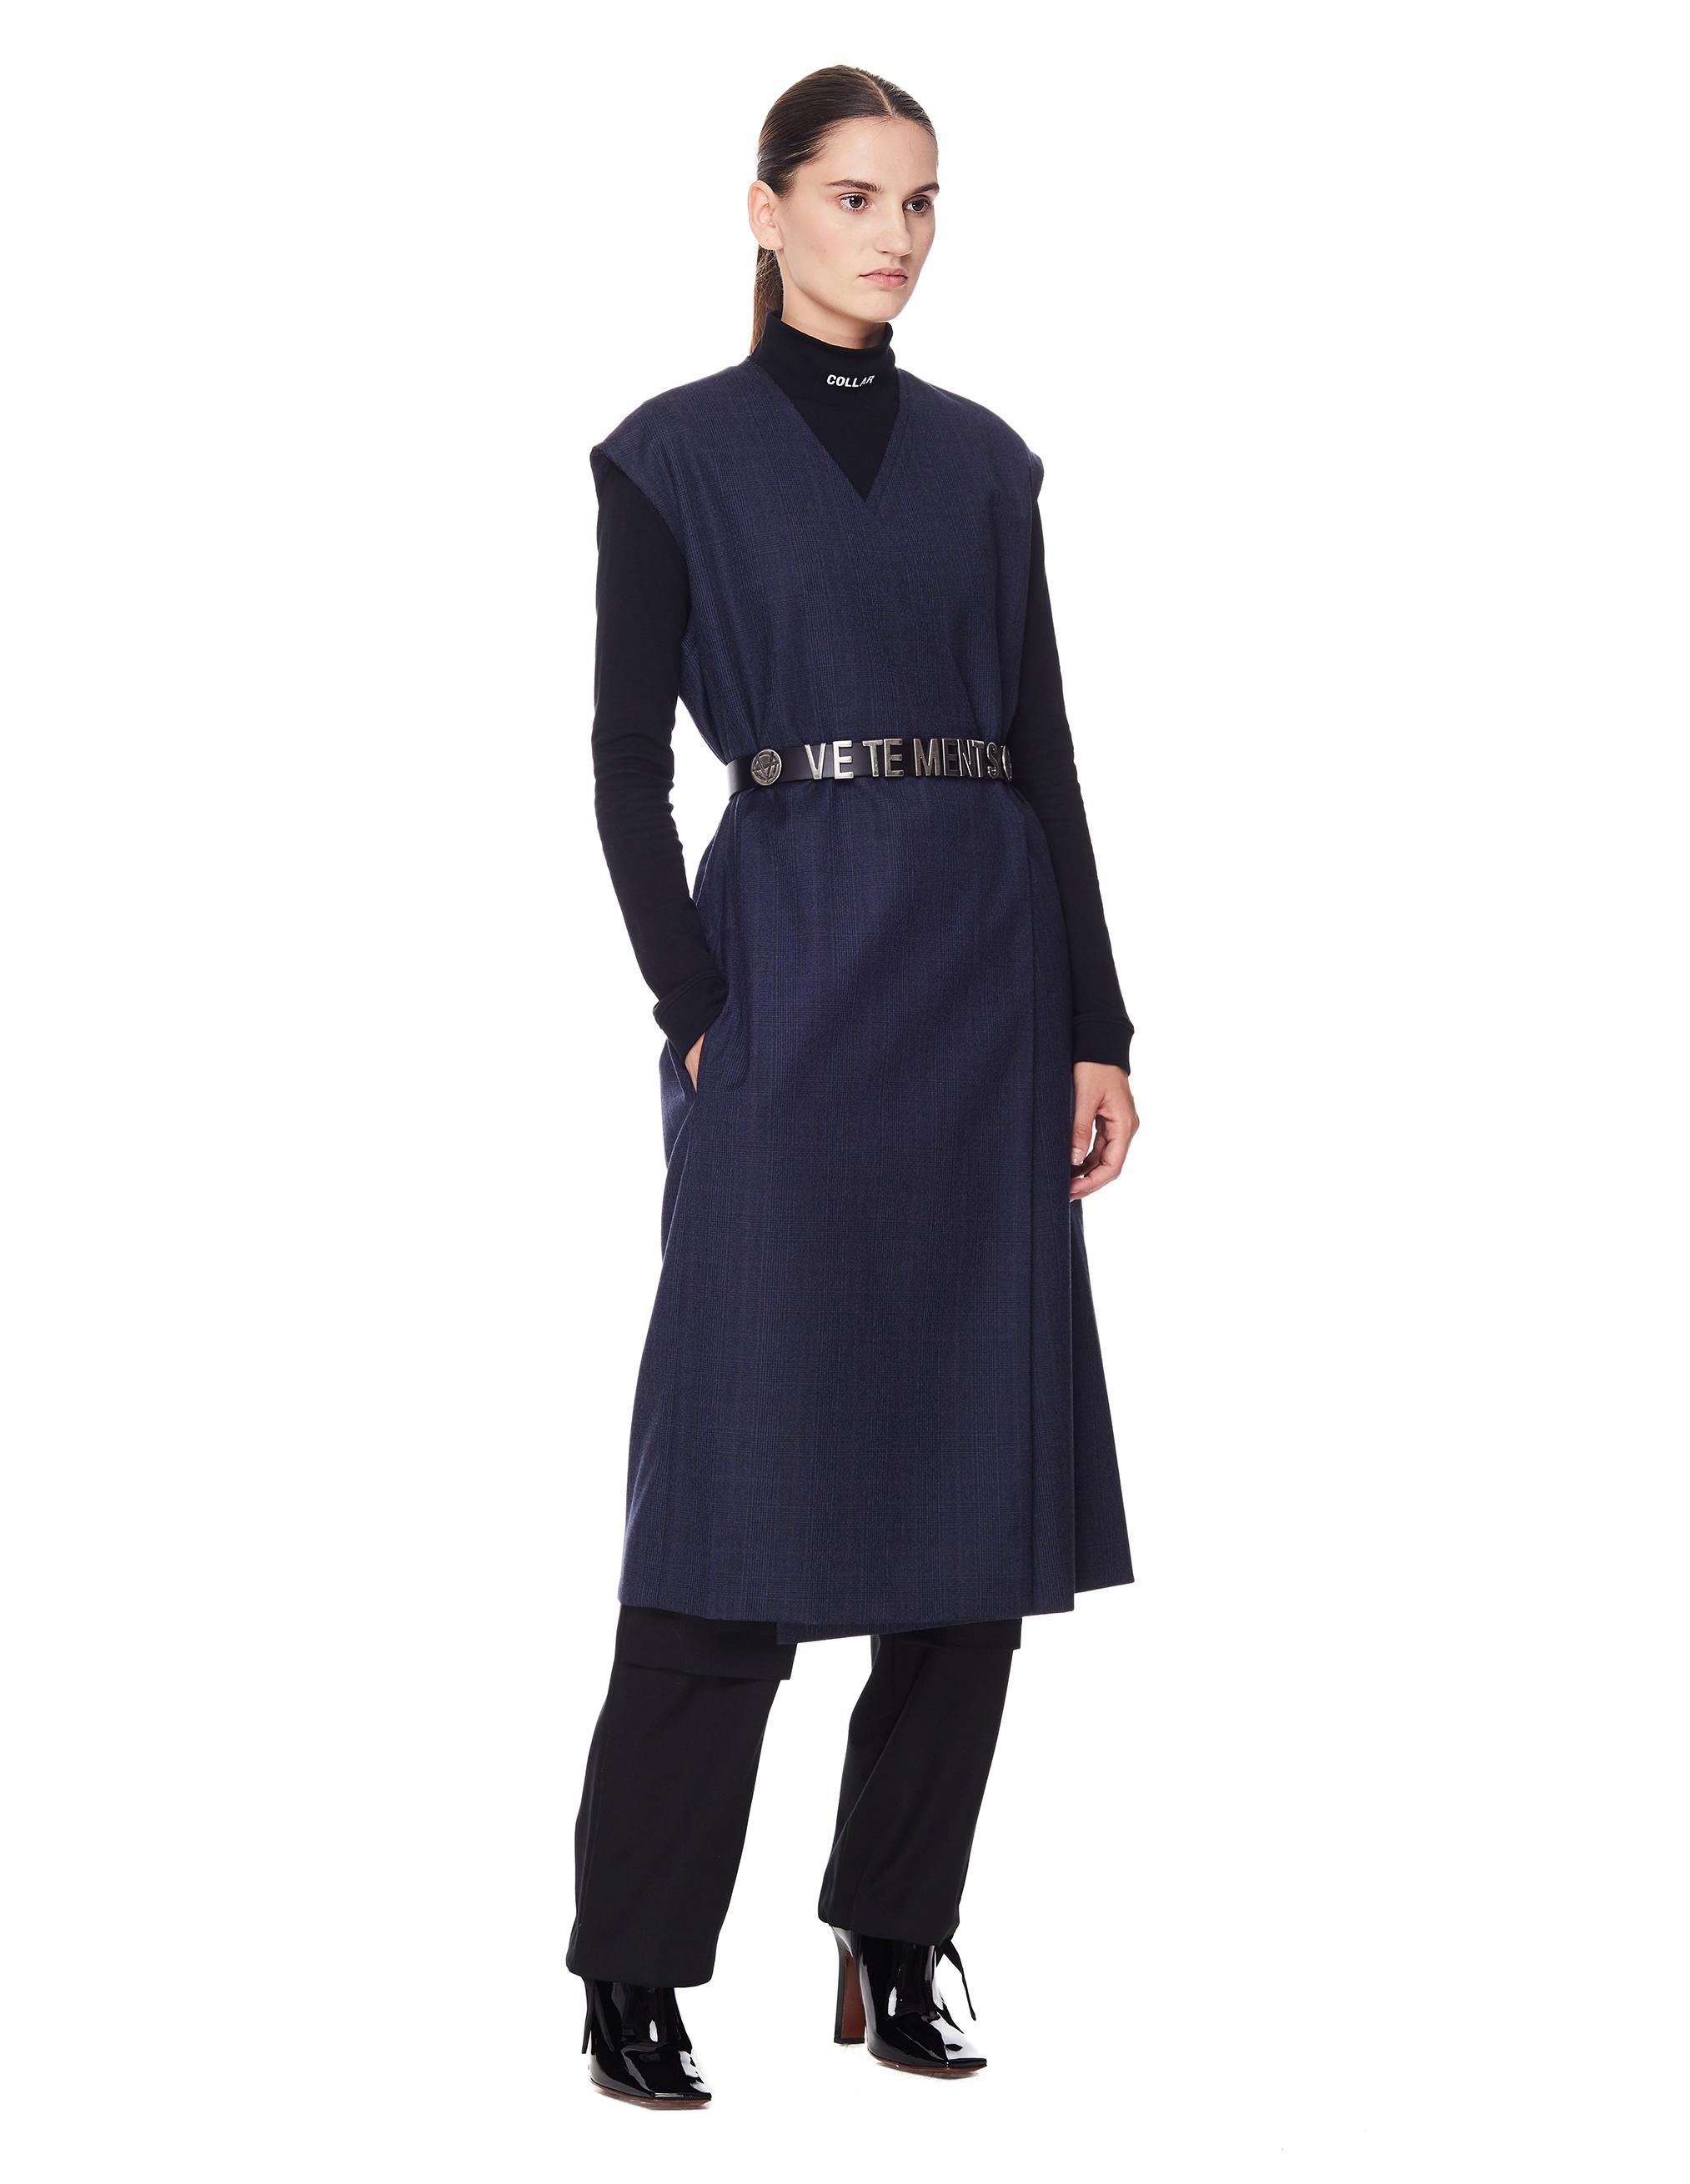 Vetements Navy Blue Wool Sleeveless Coat